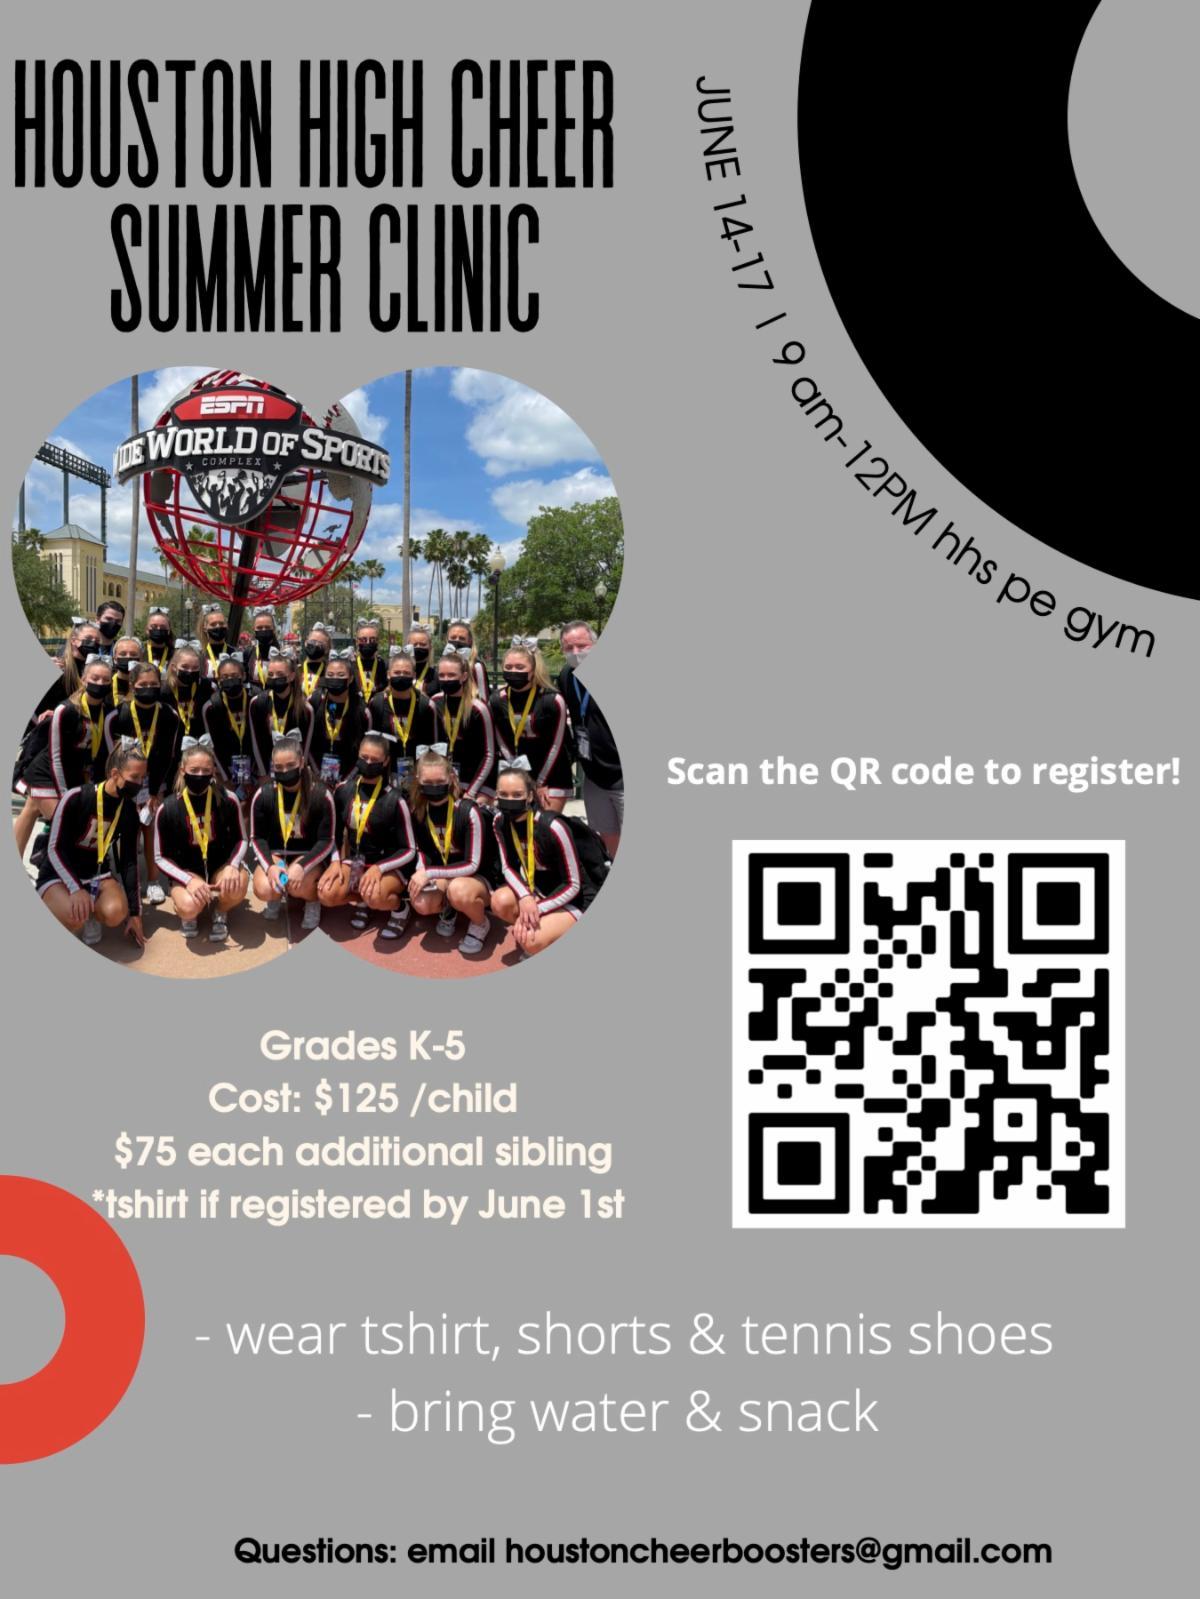 Houston High Summer Cheer Clinic.jpg